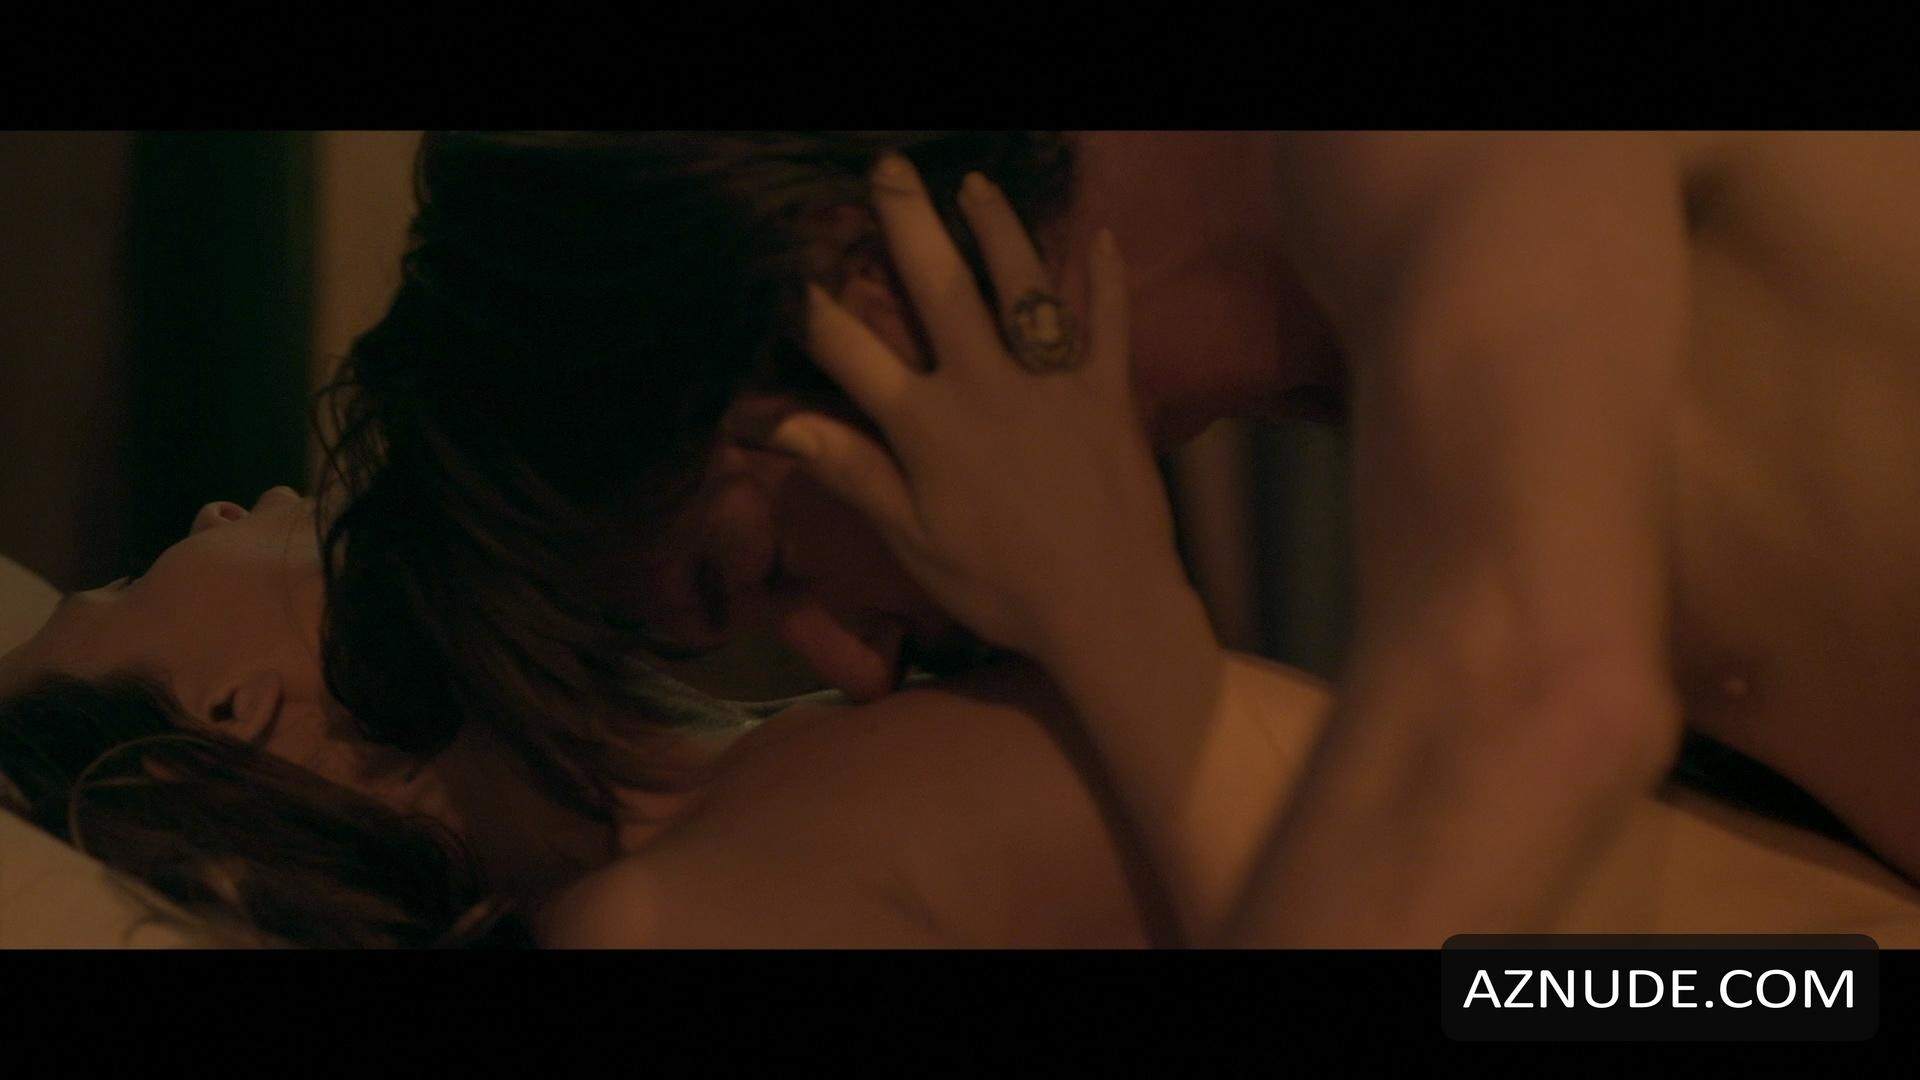 The Lookalike Nude Scenes - Aznude Men-9223